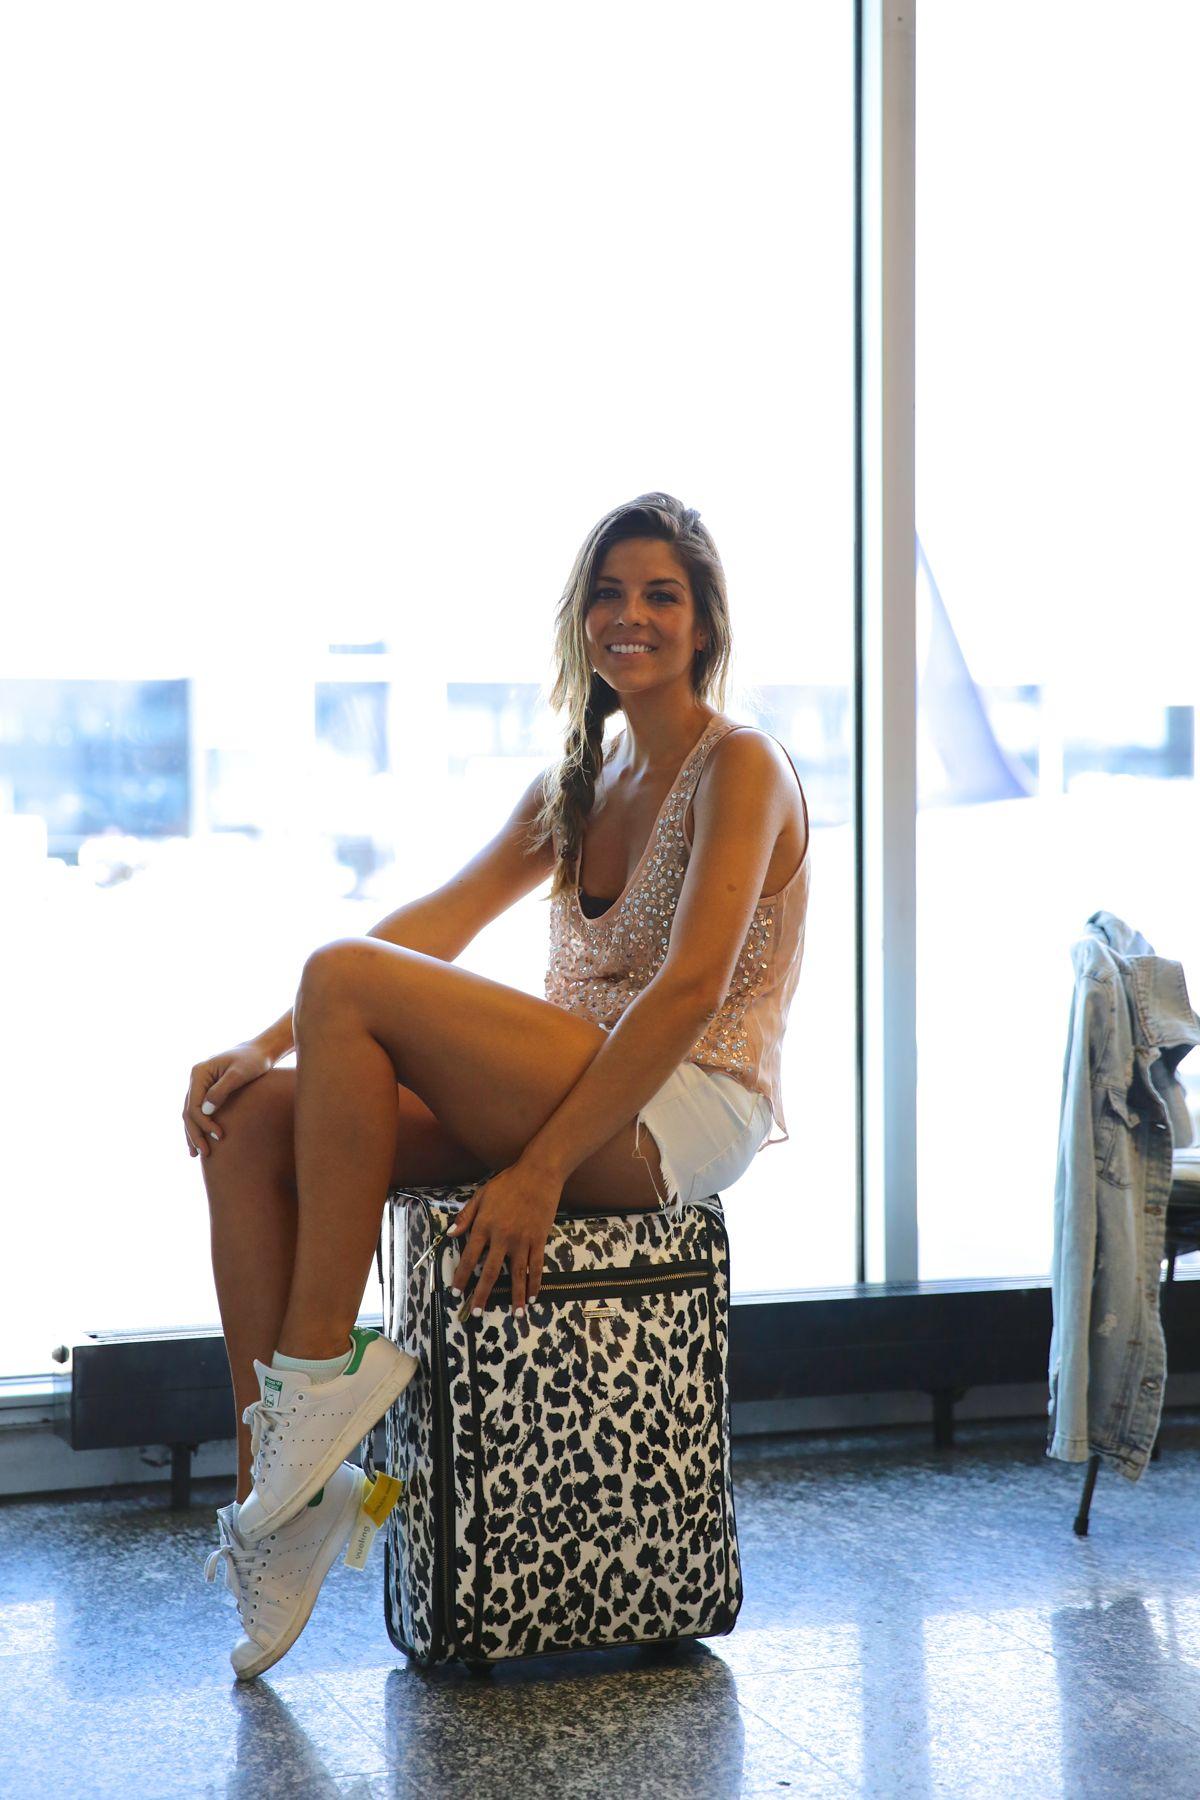 trendy_taste-look-outfit-street_style-ootd-blog-blogger-fashion_spain-moda_españa-traveling-viaje-frankfurt-stan_smith-adidas-lentejuelas-top-denim-shorts-vaqueros_rotos-5